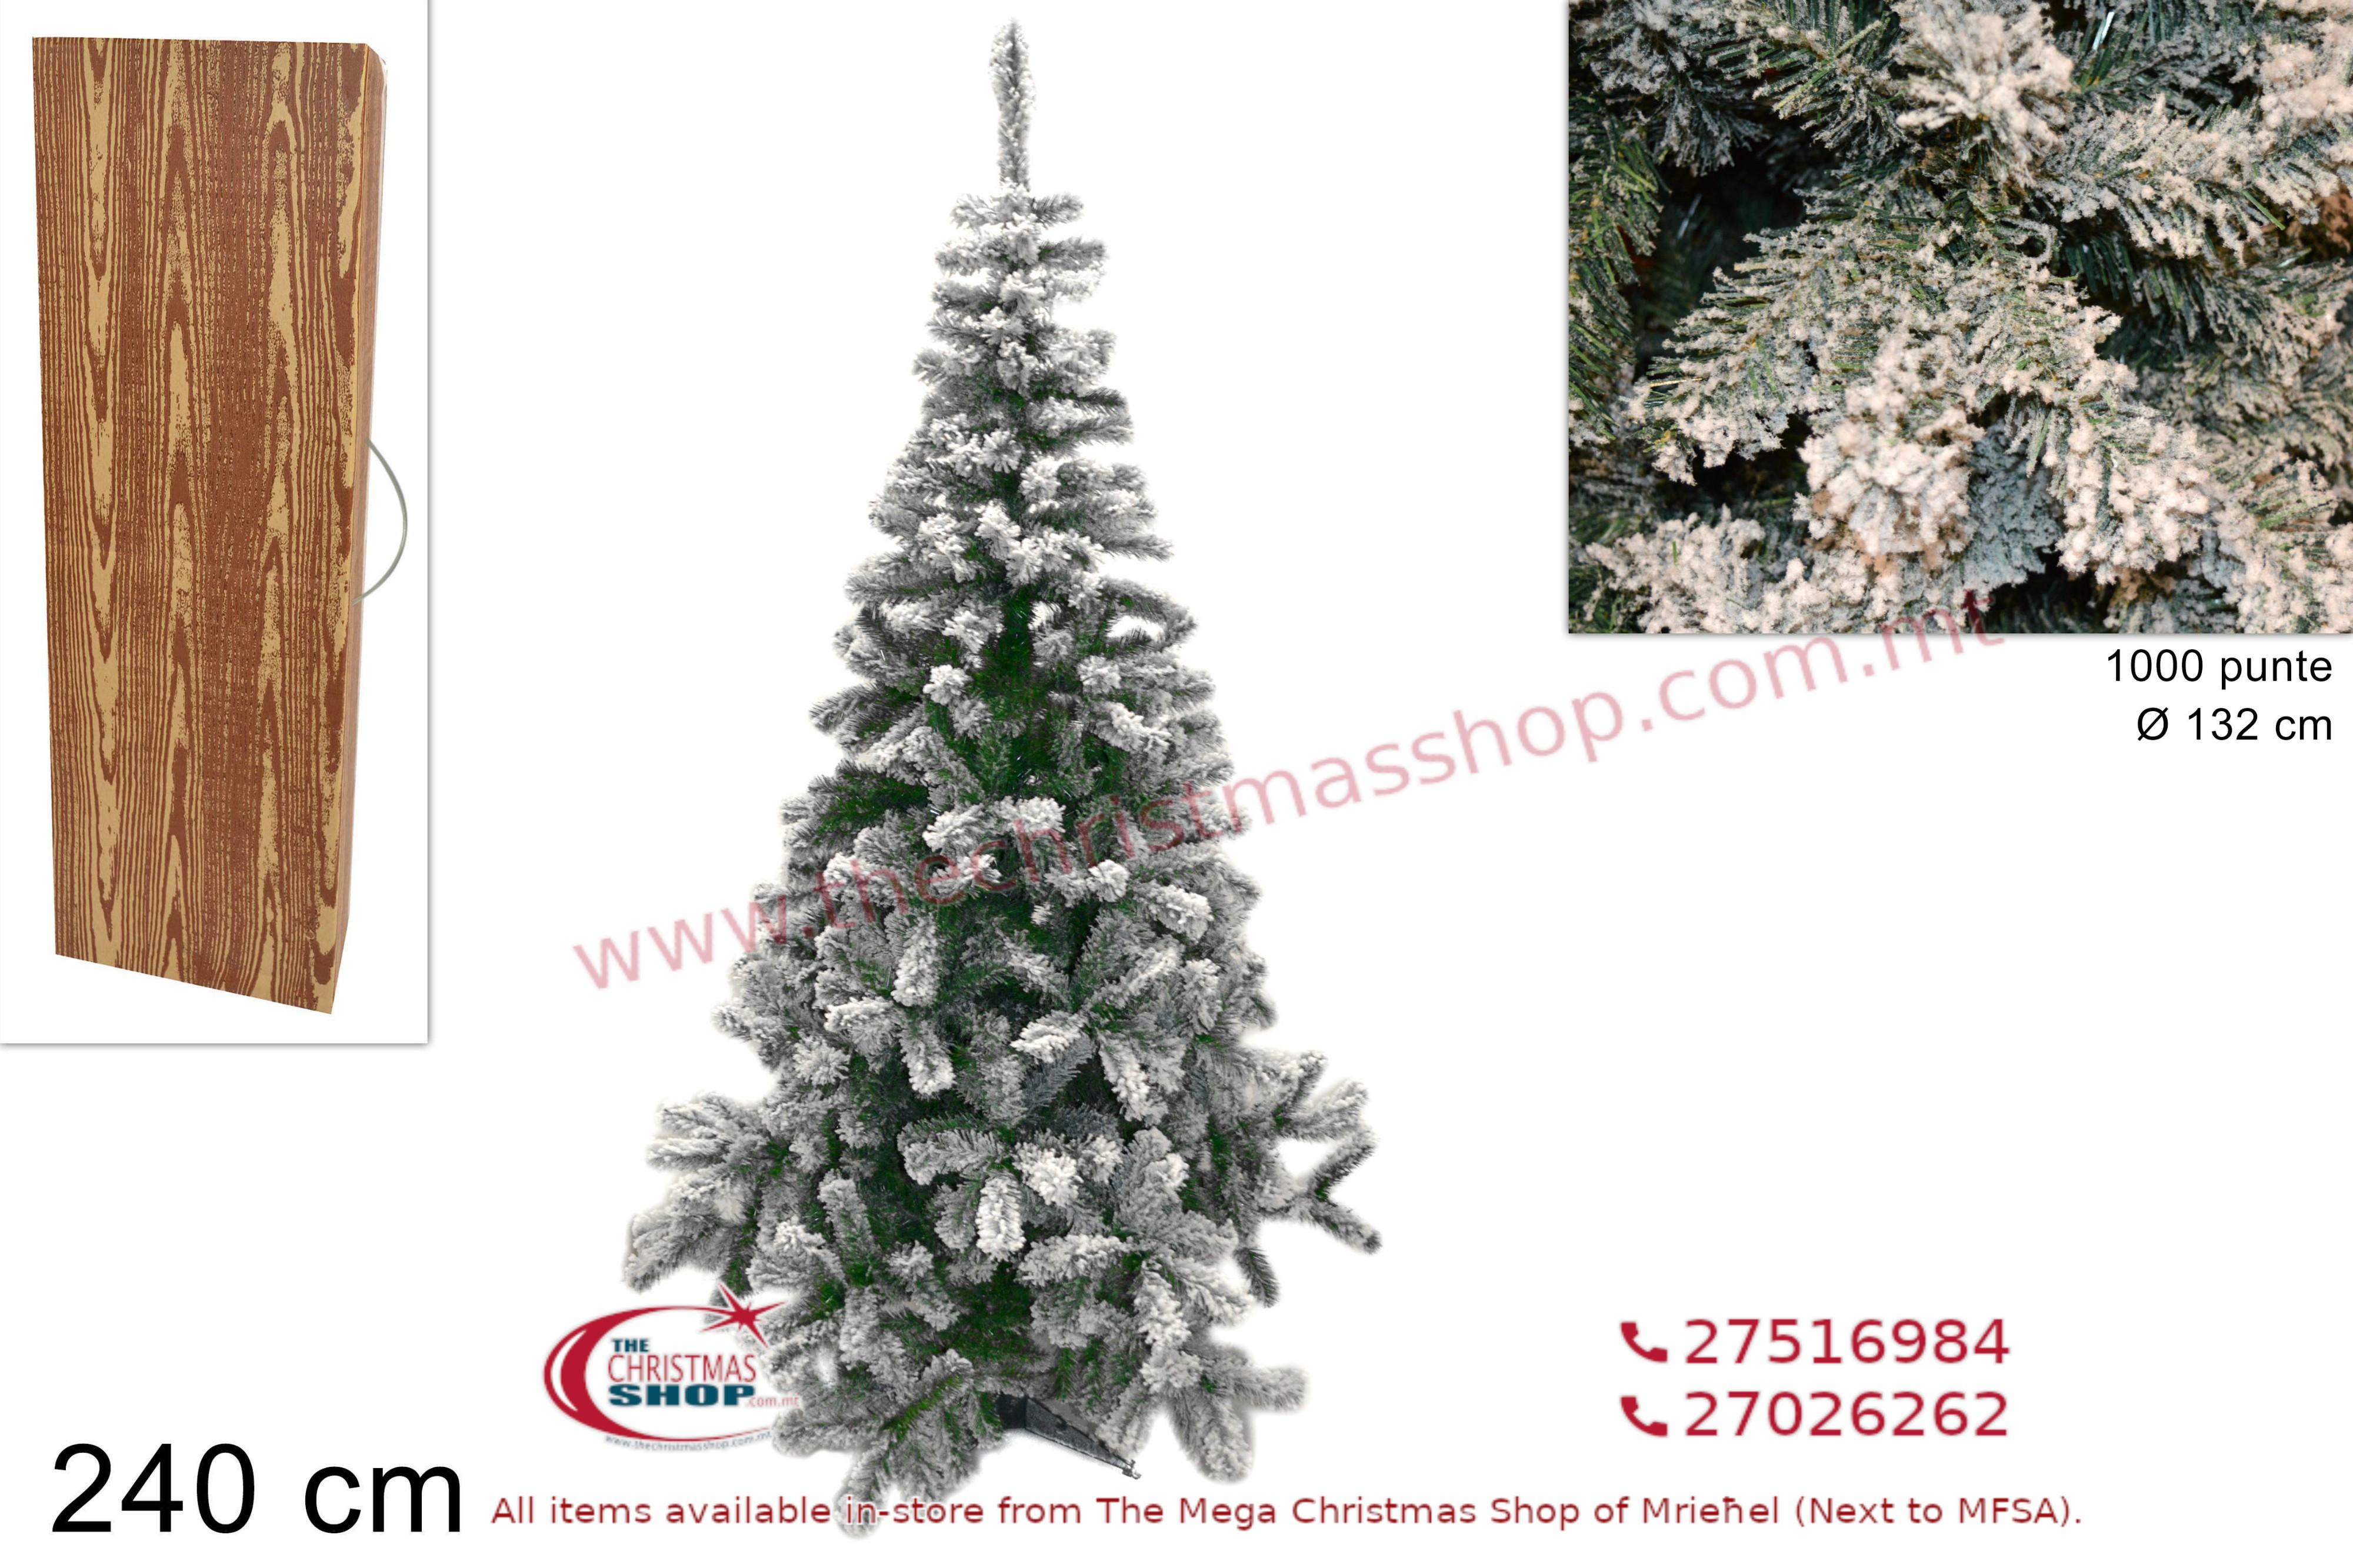 CHRISTMAS TREE LAPPONIA INNEVATO. 240CMS. DE427640